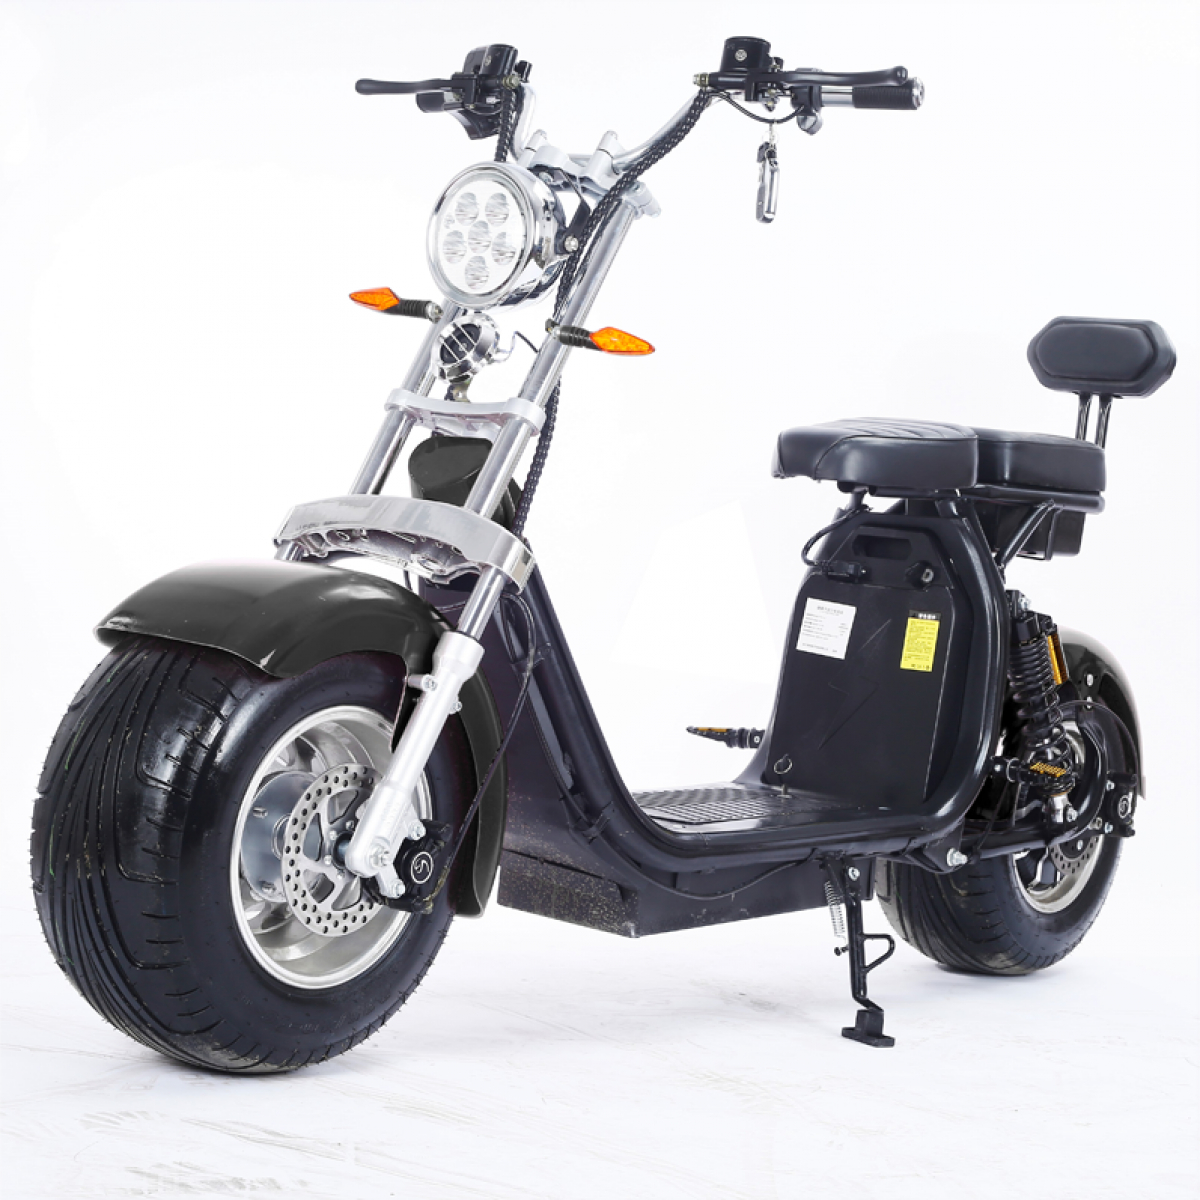 Moto Elétrica RideMode ECO 2000w Aluminium, Black, EM-02-FB